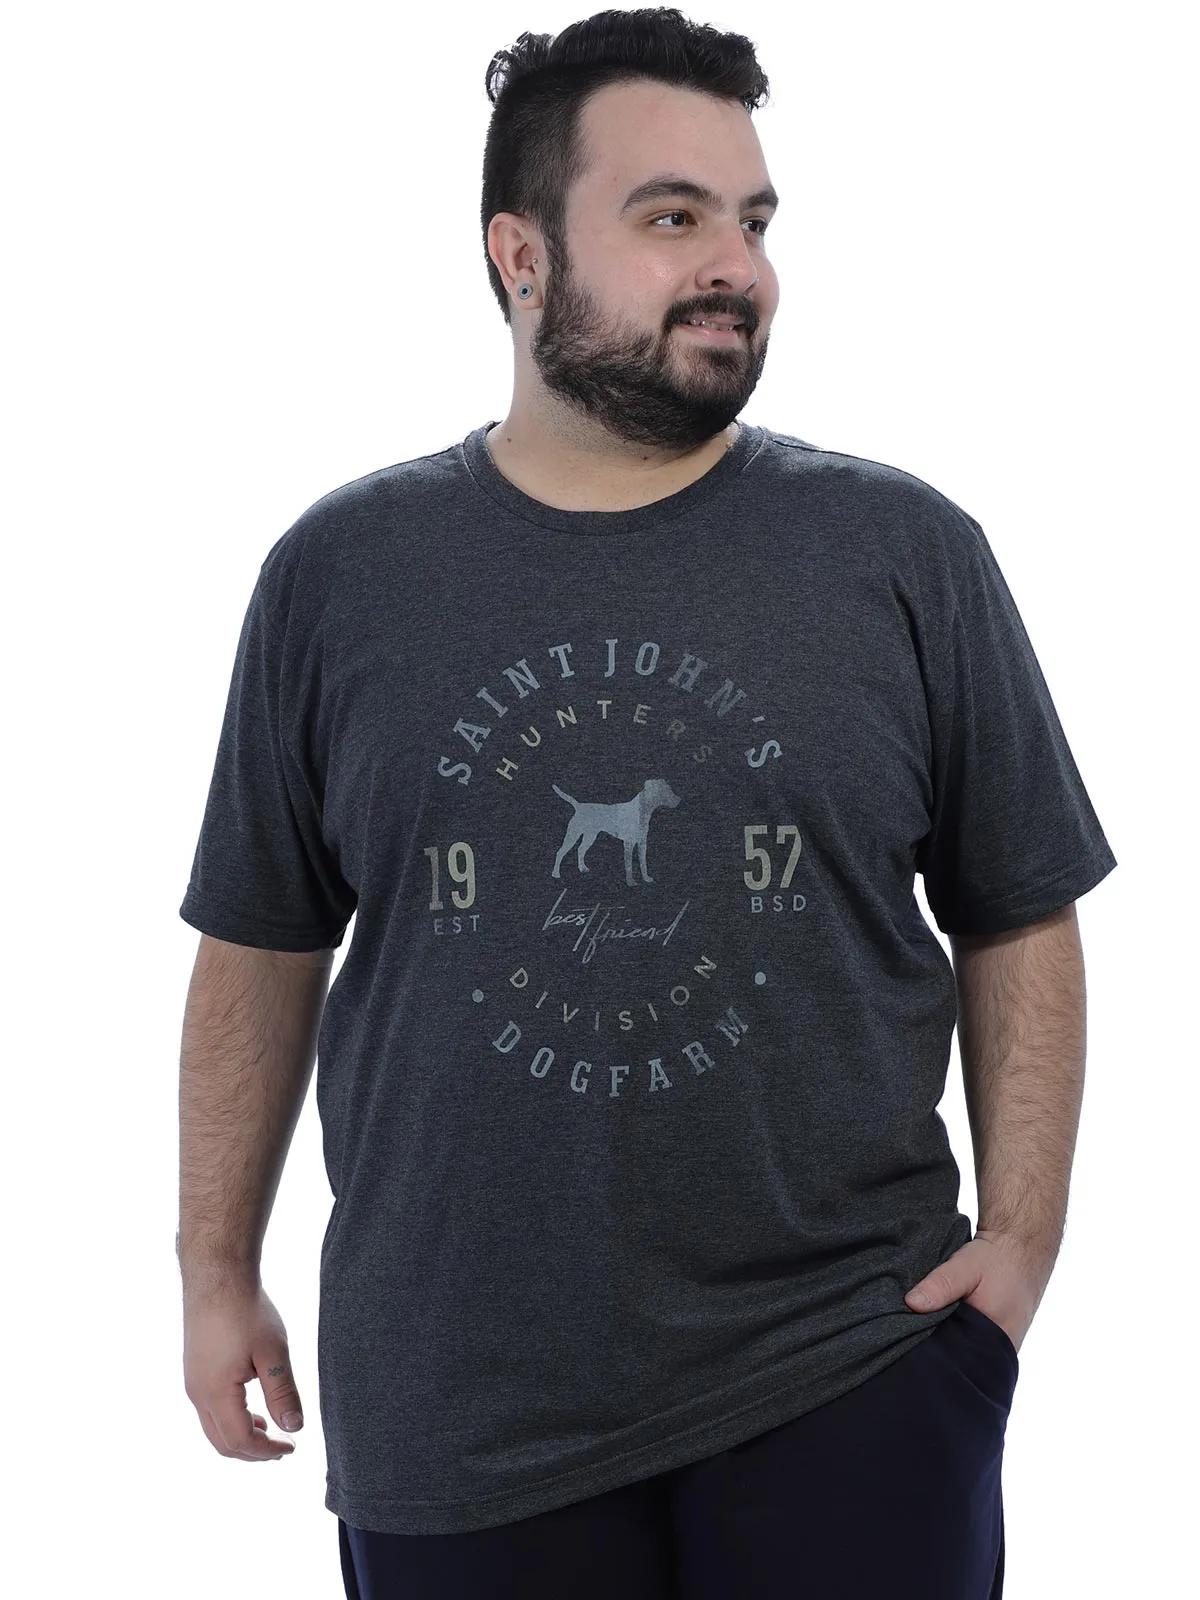 Camiseta Plus Size Masculina Algodão Gola Careca Preta